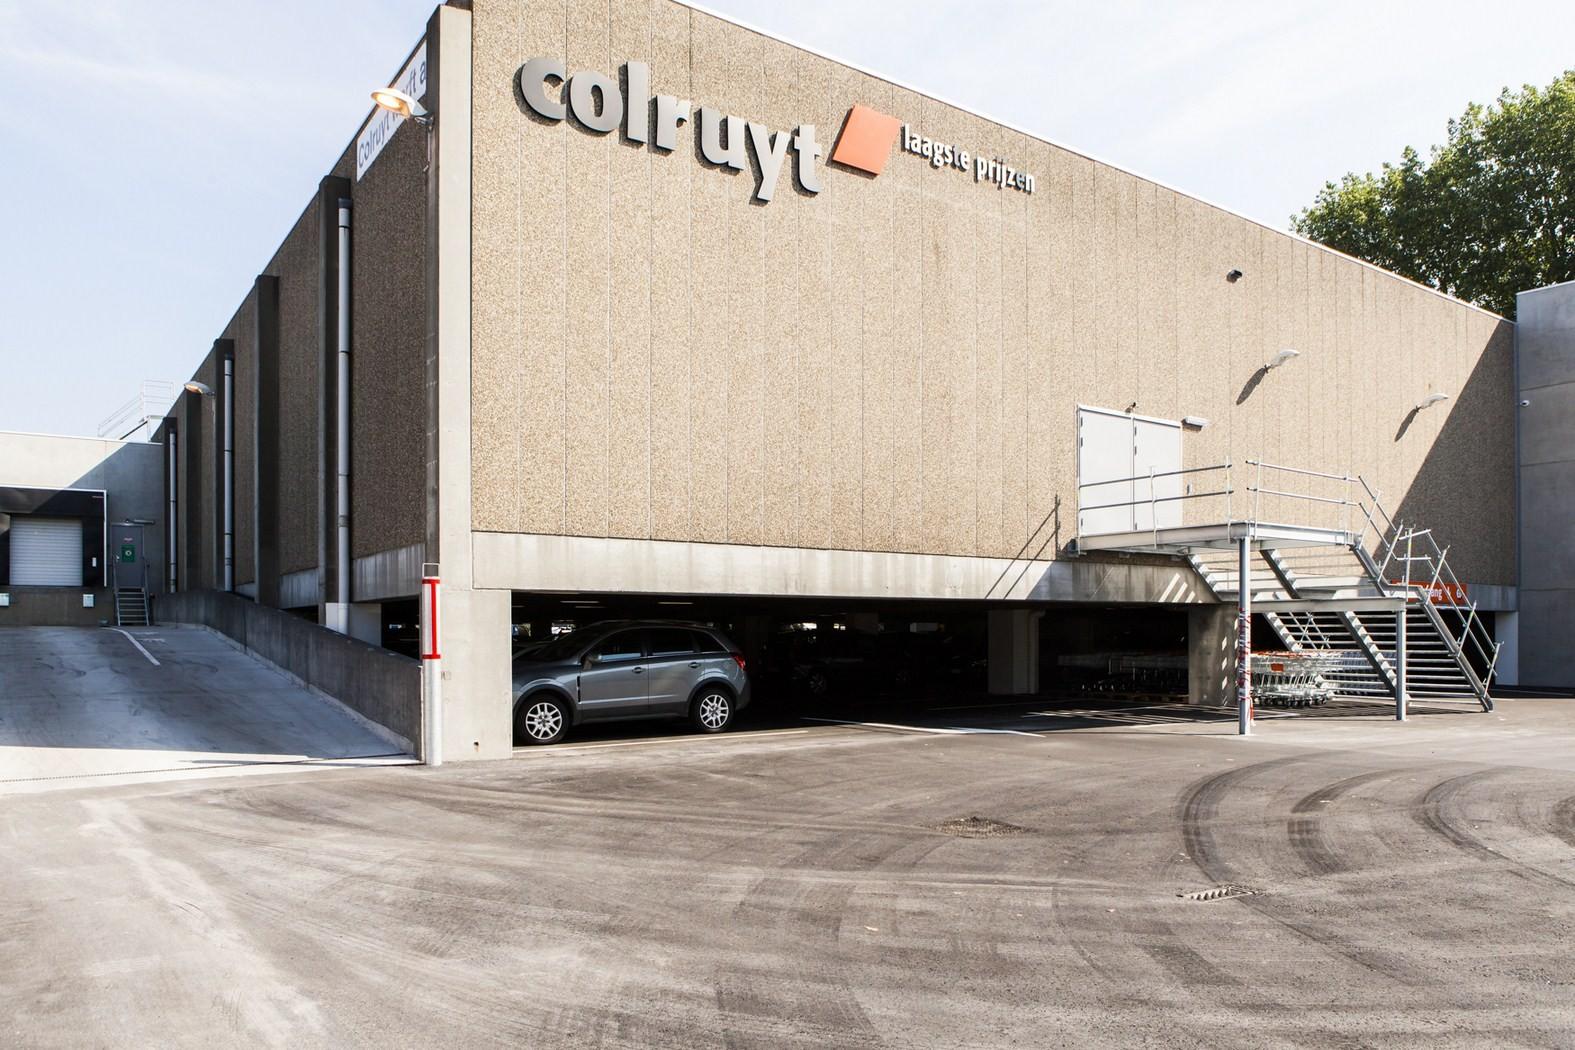 Colruyt_Brugge_winkelgebouw (17).jpg